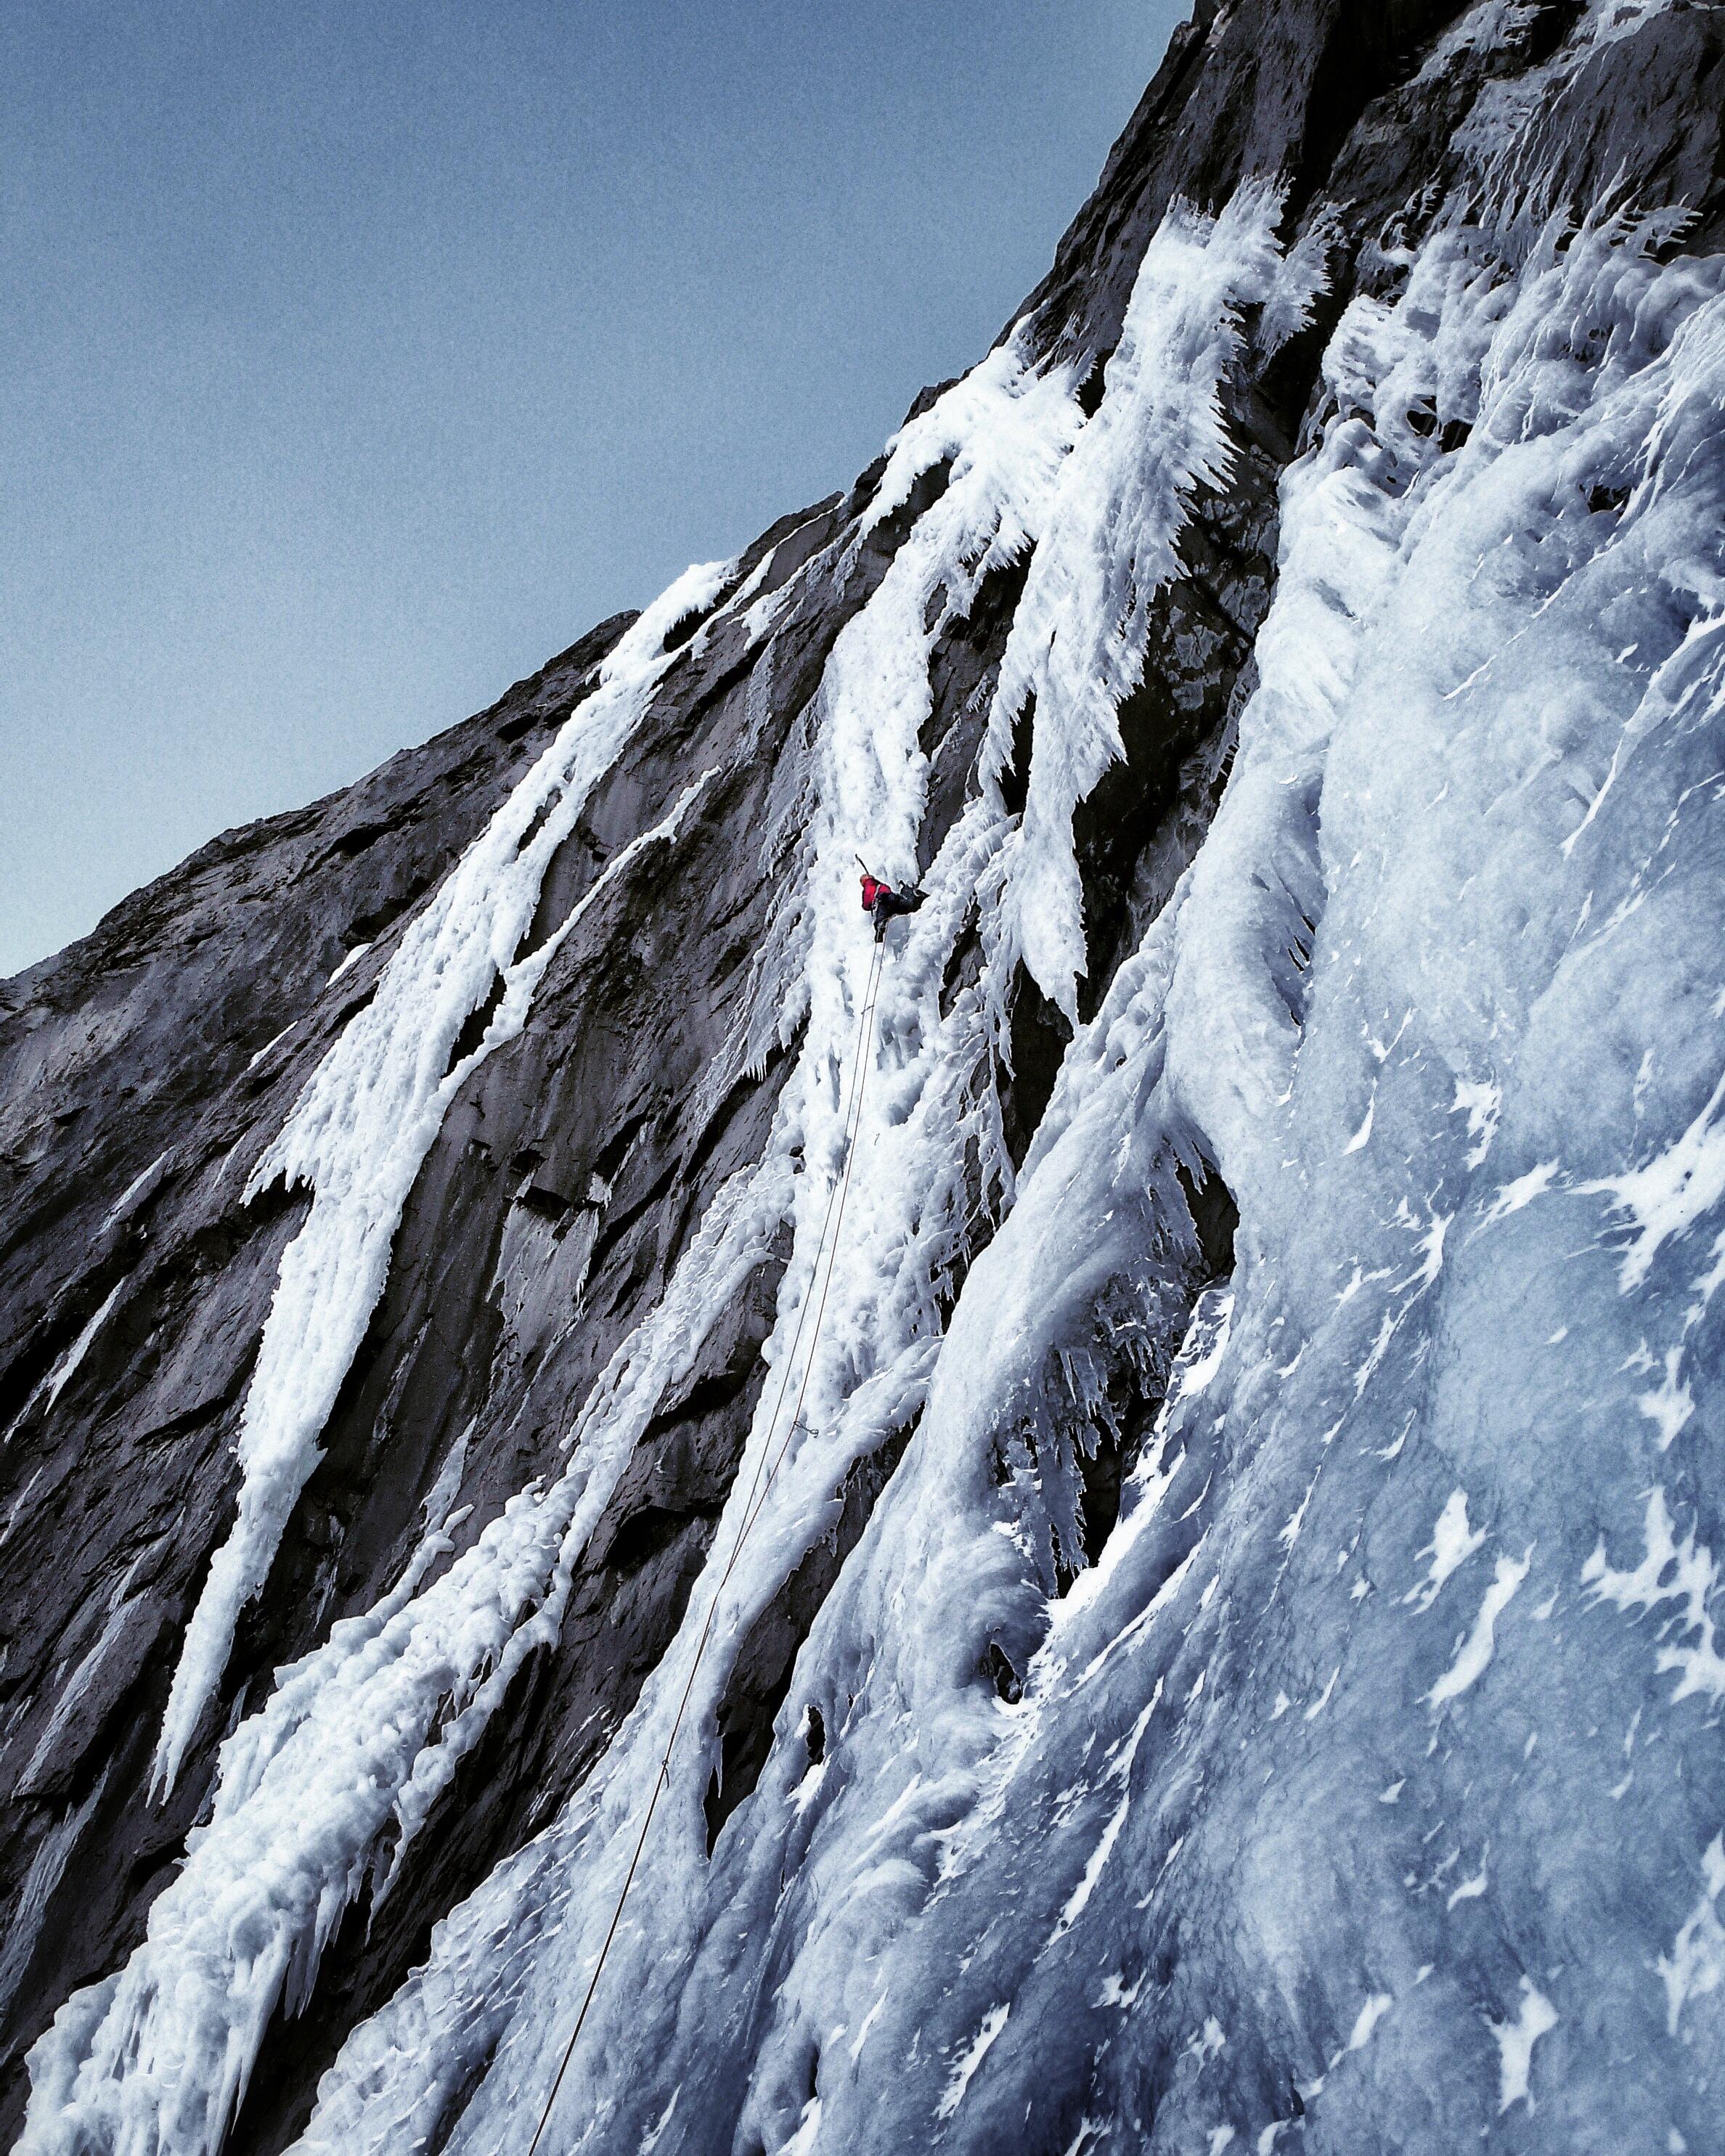 Matthias Scherer on The Replicant, Trophy Wall, Canada - picture Tanja Schmitt